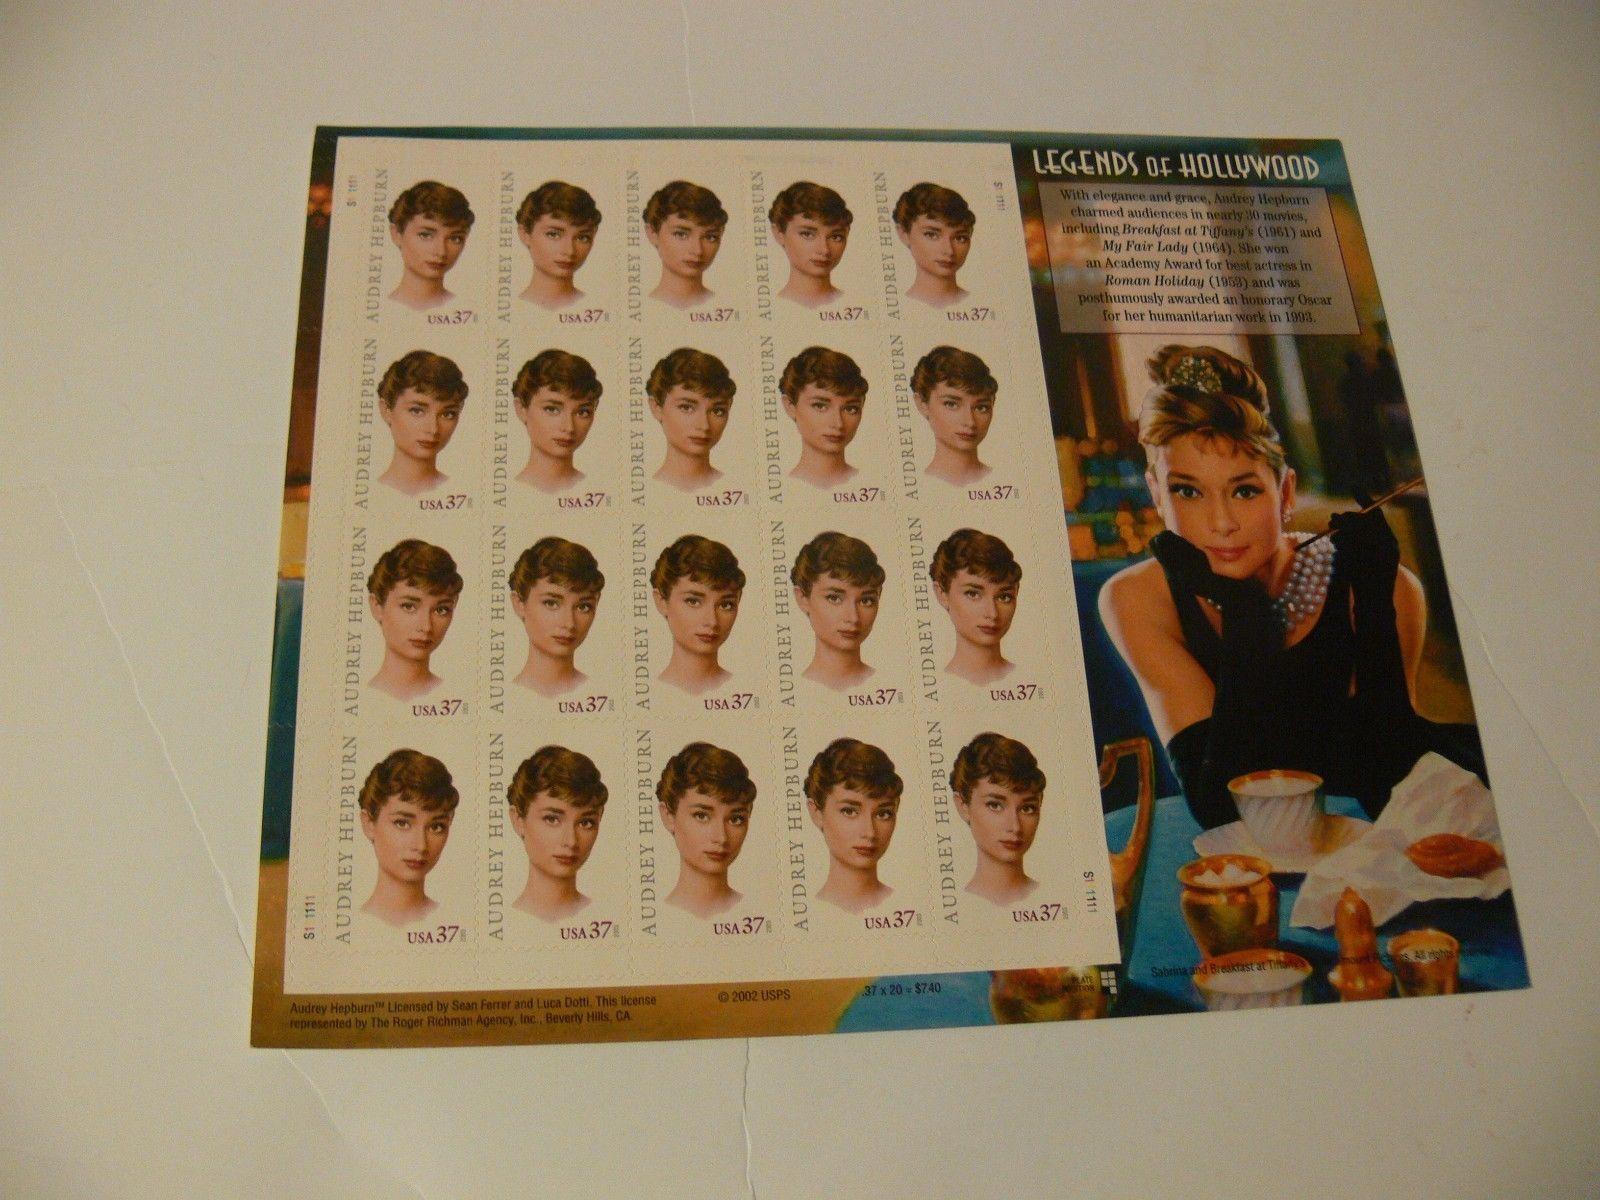 #3786 AUDREY HEPBURN Legends of Hollywood Full mint sheet of 20 stamps